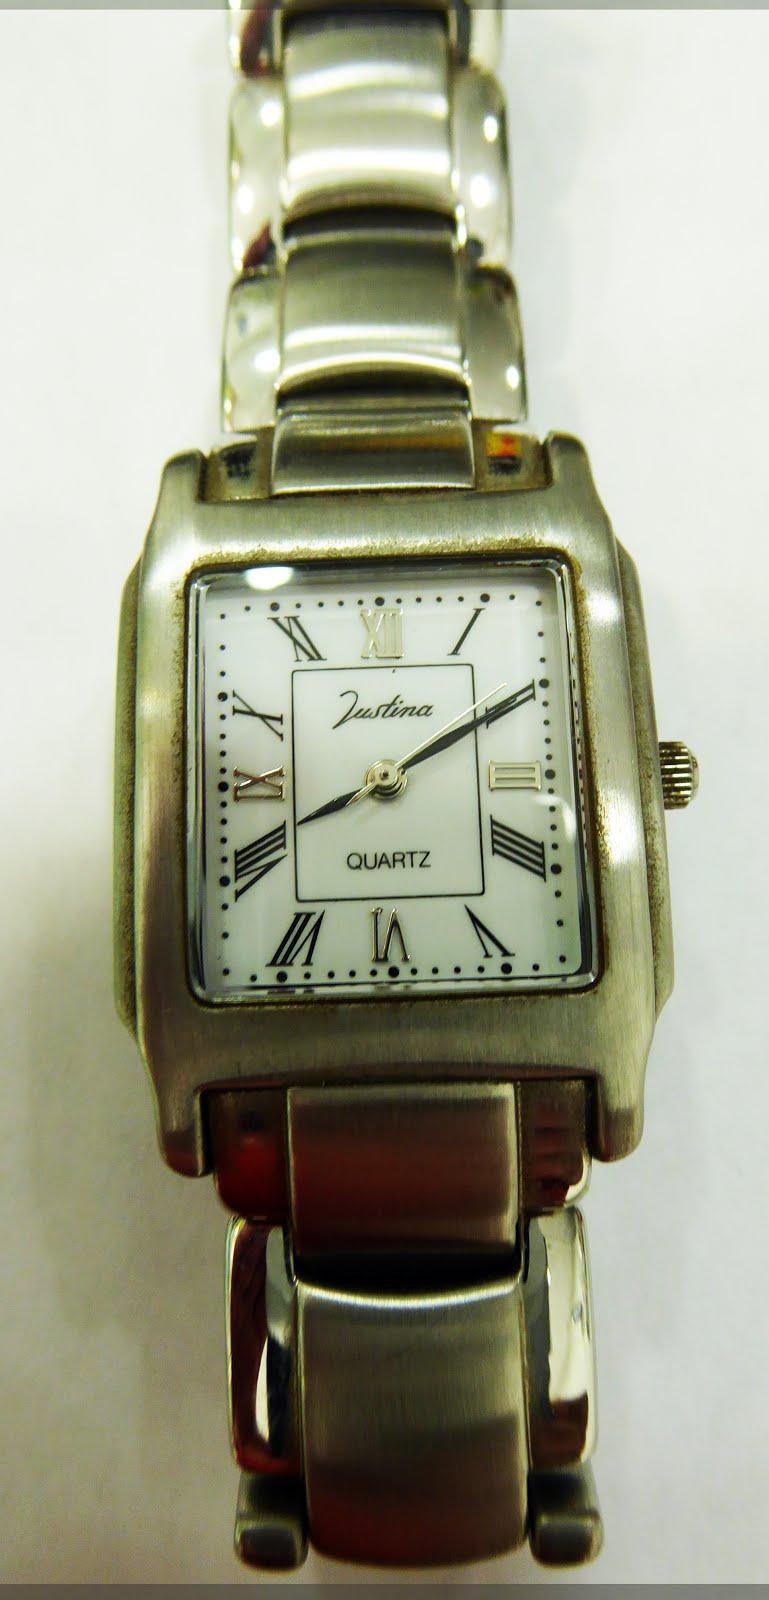 Reloj señora modelo clásico Justina